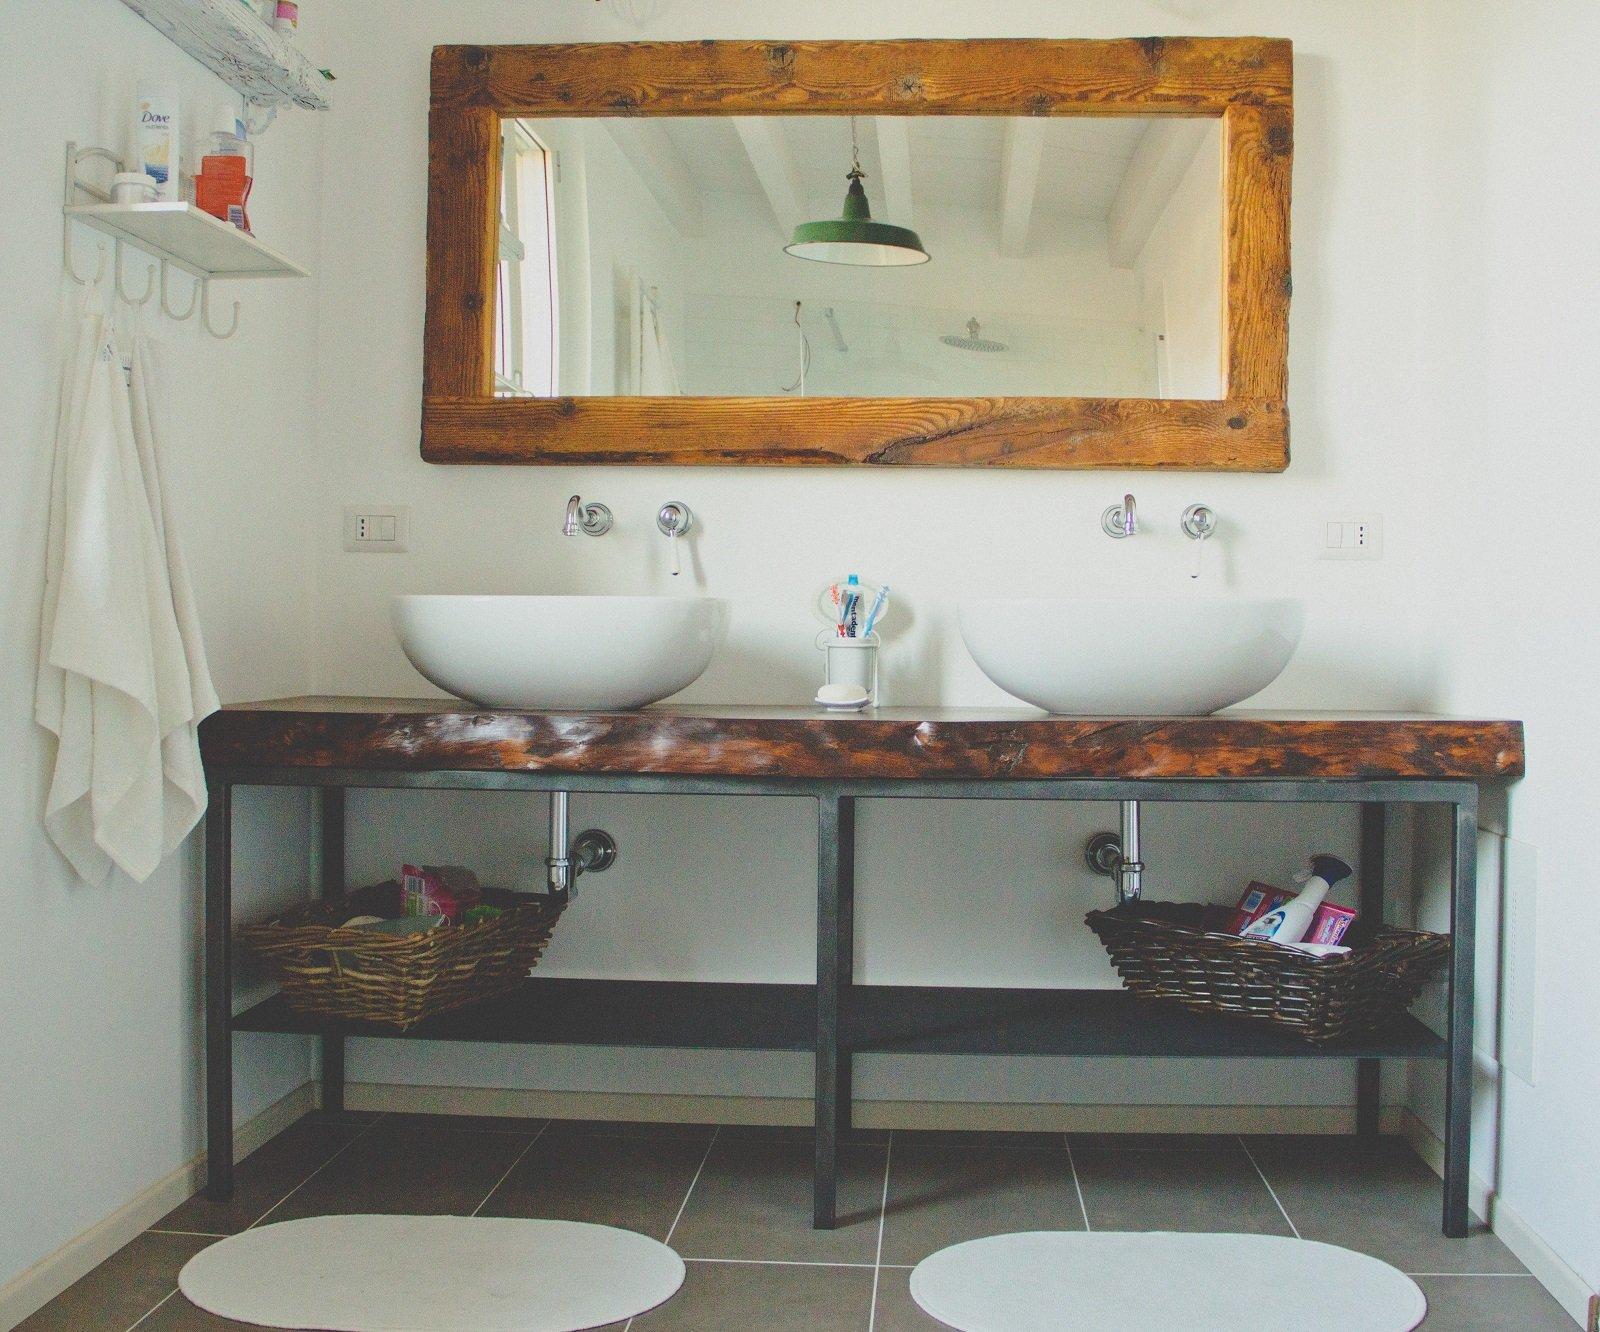 Arredi d 39 epoca e pezzi di recupero per la casa di campagna restaurata cose di casa - Cucine maison du monde ...